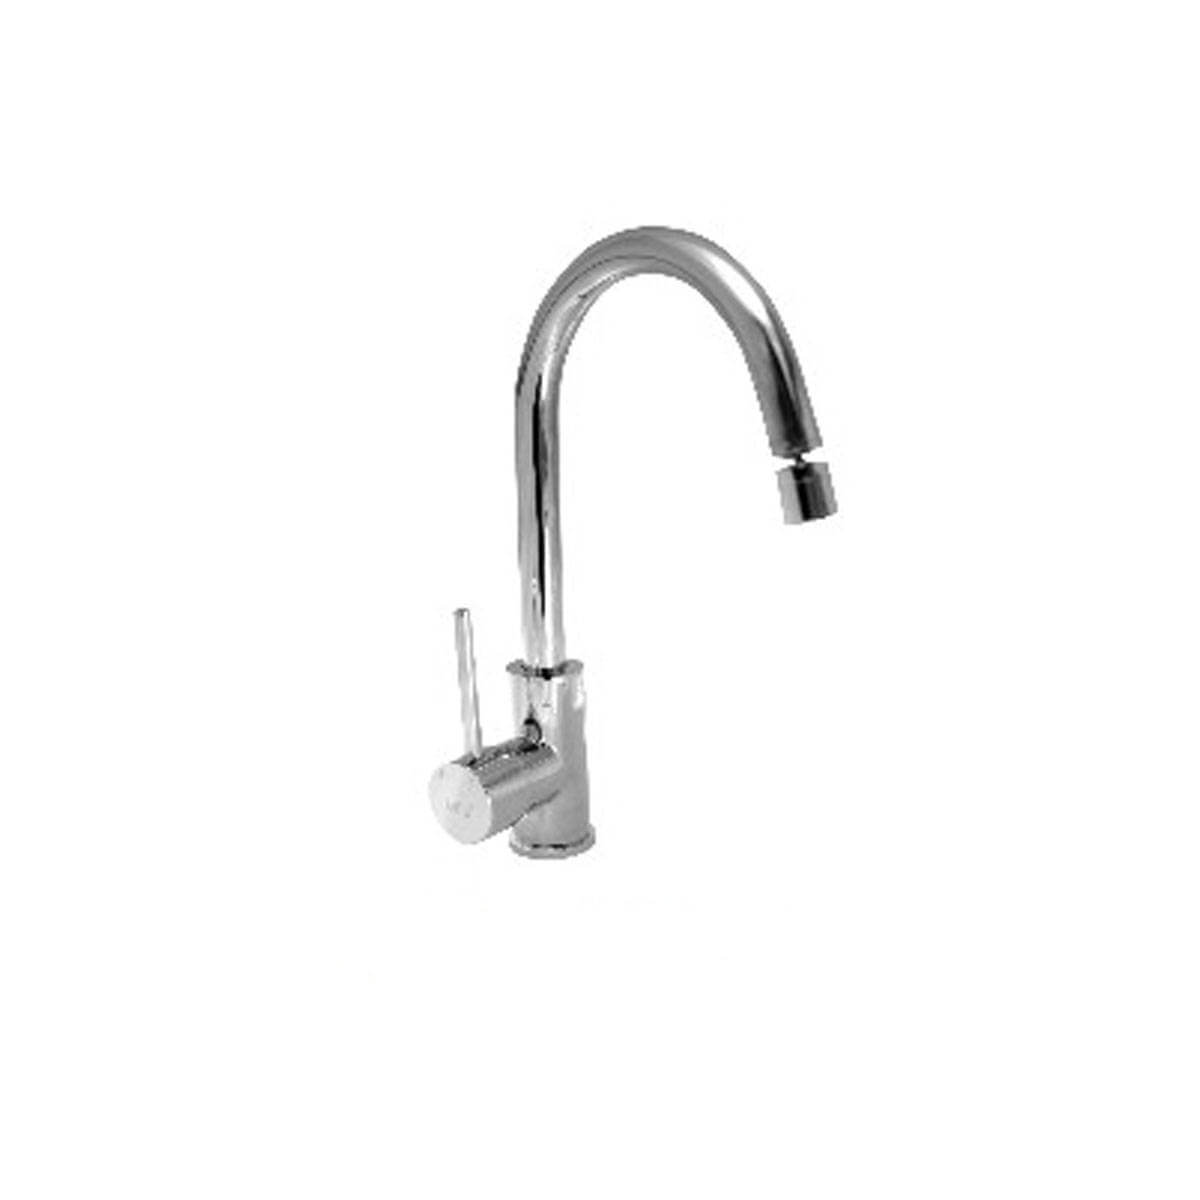 Vòi rửa bát AMTS AM-4300